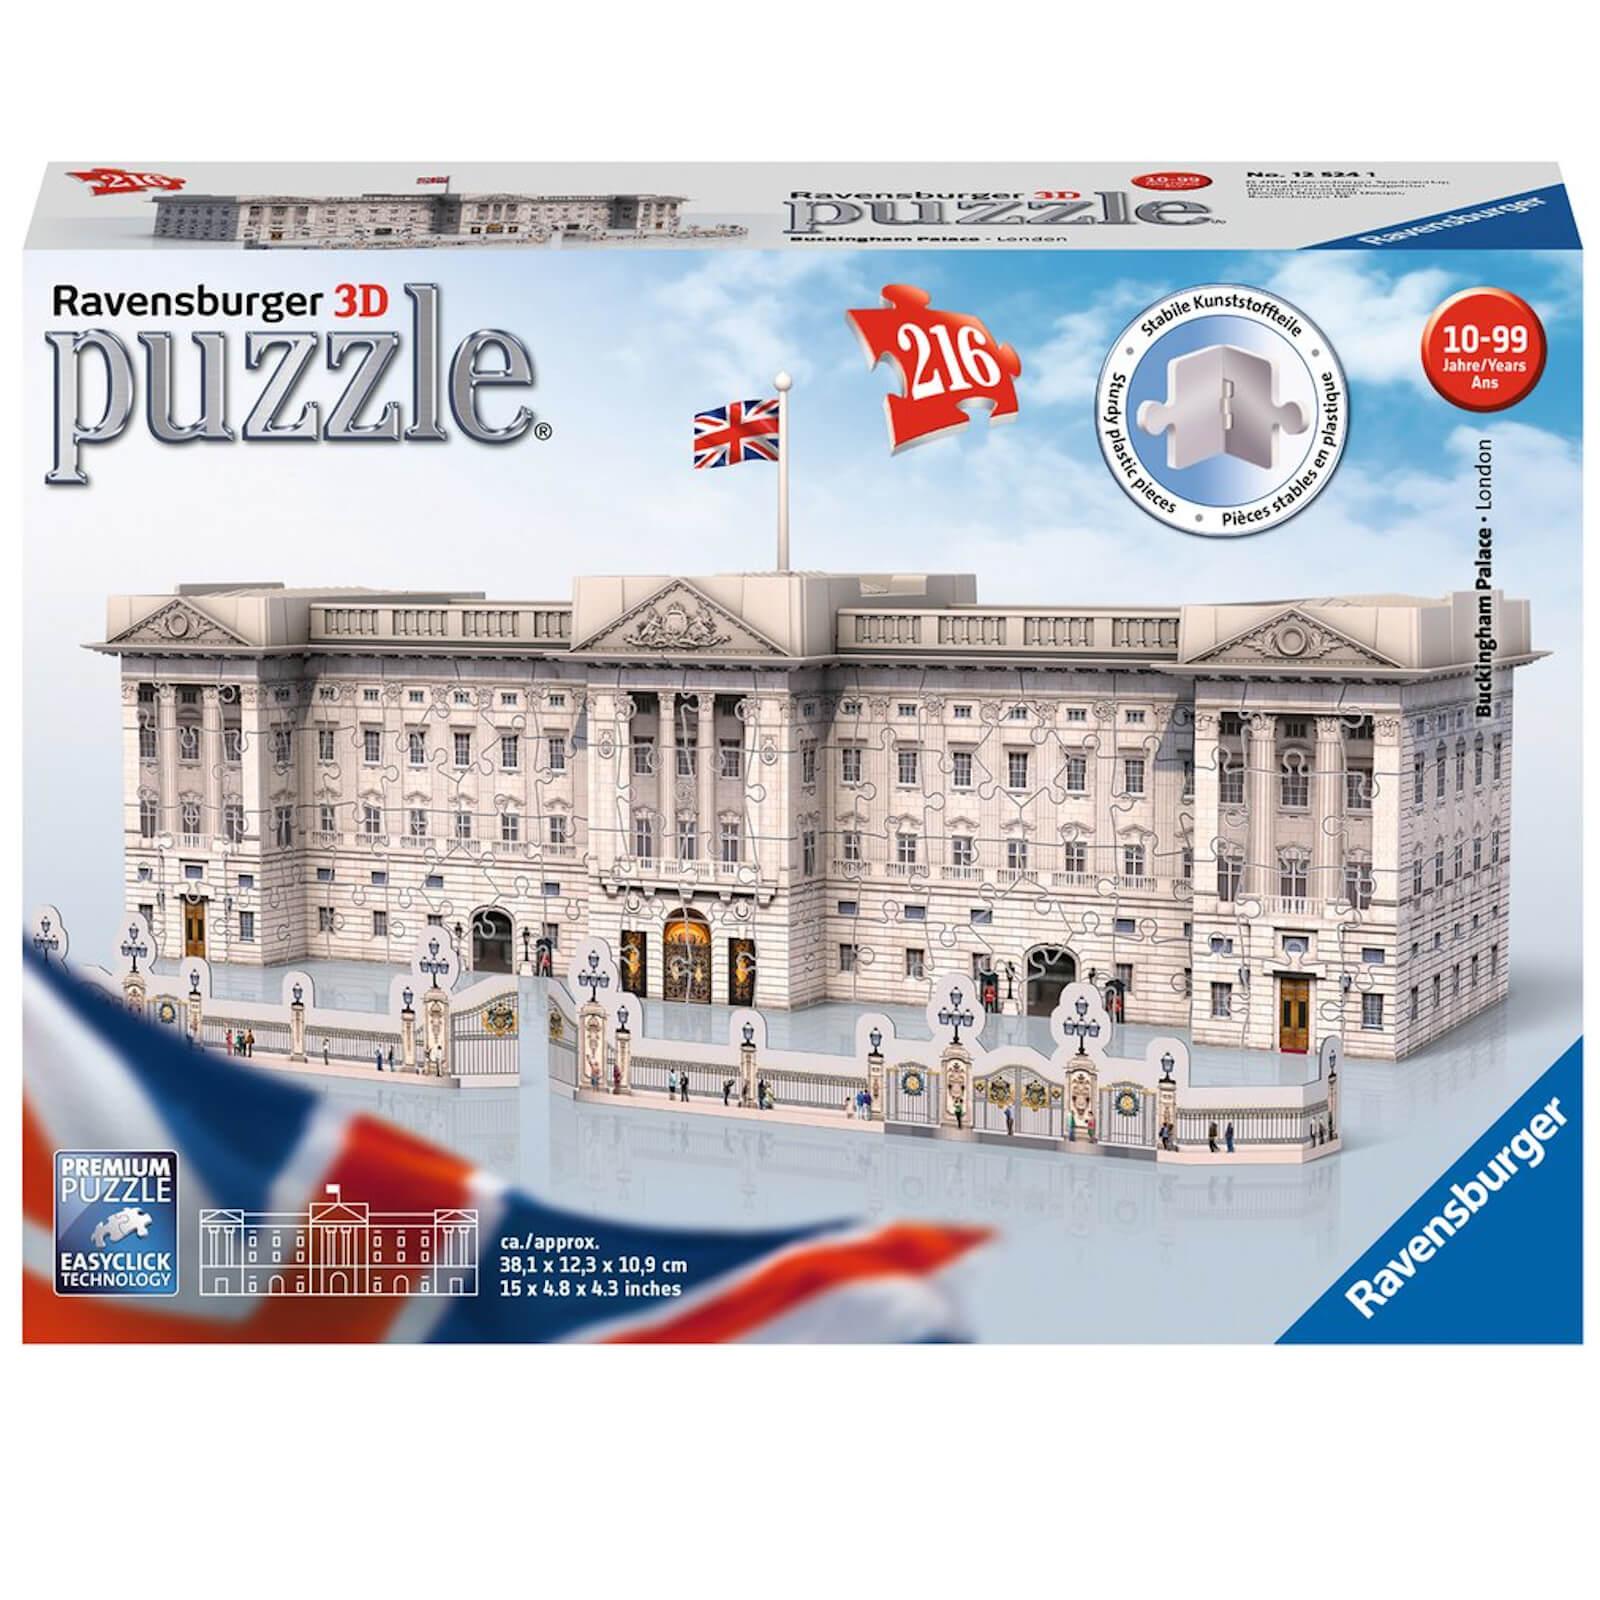 Image of Ravensburger Buckingham Palace 3D Jigsaw Puzzle (216 Pieces)